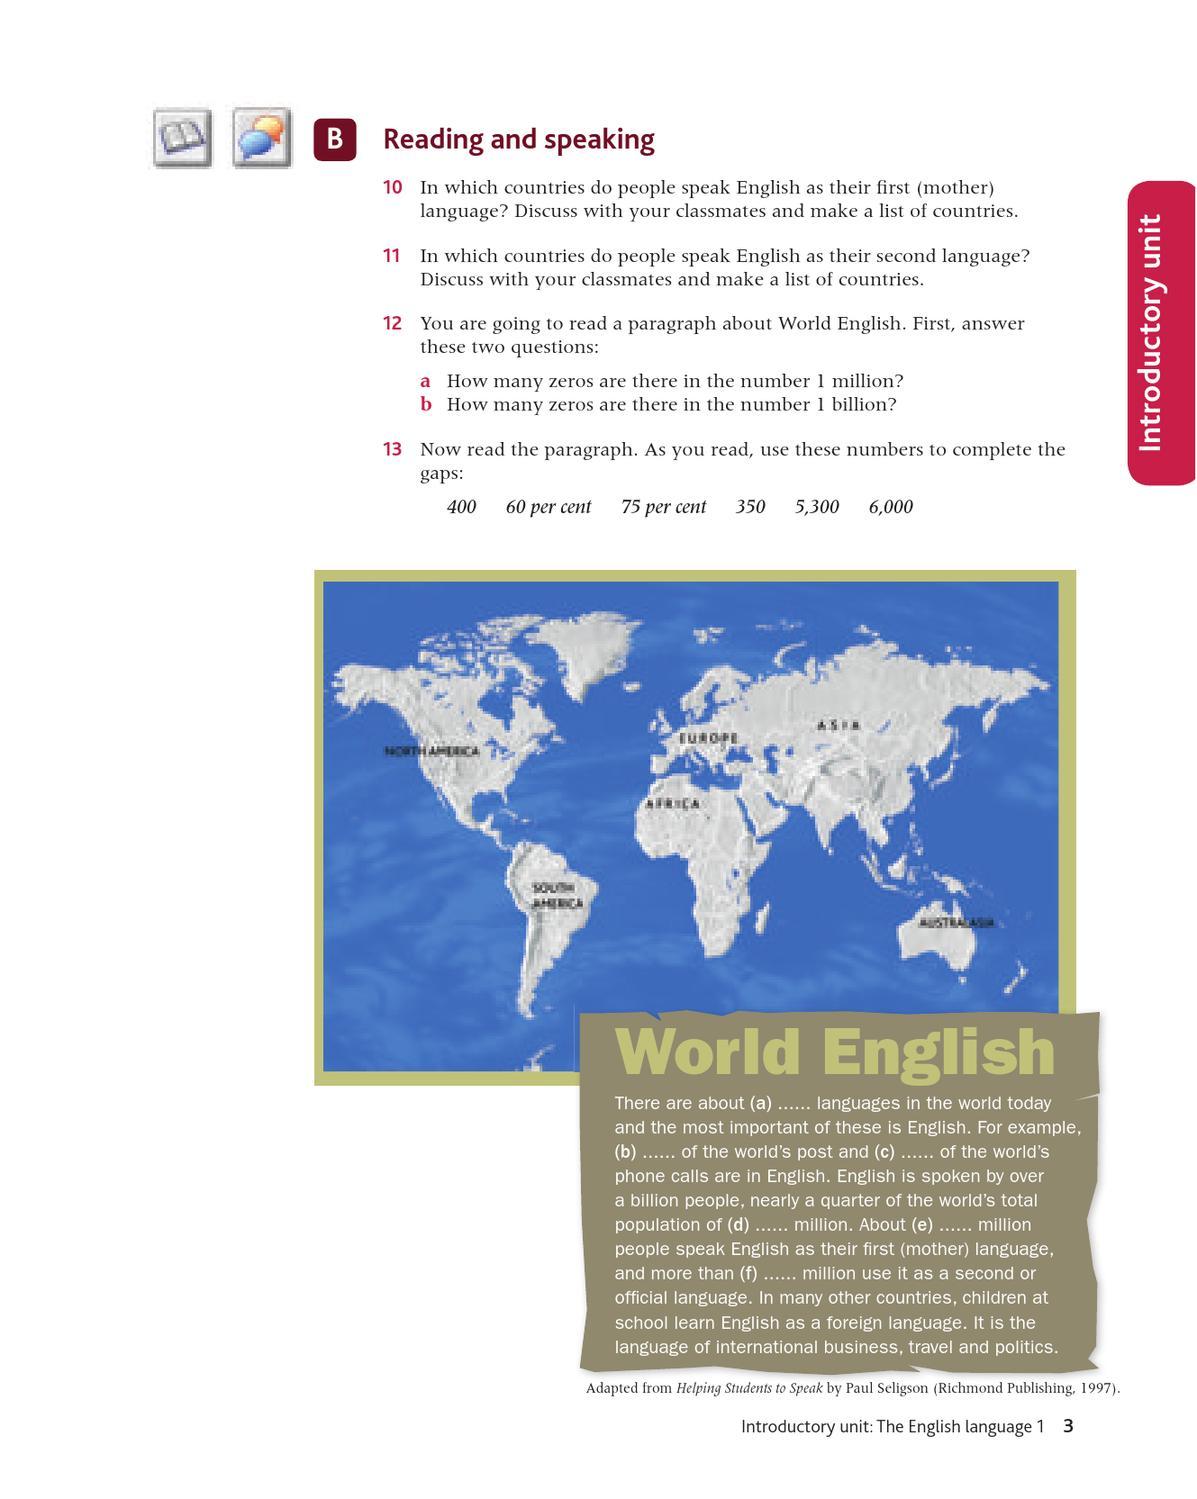 Cambridge IGCSE English as a Second Language: Coursebook 1